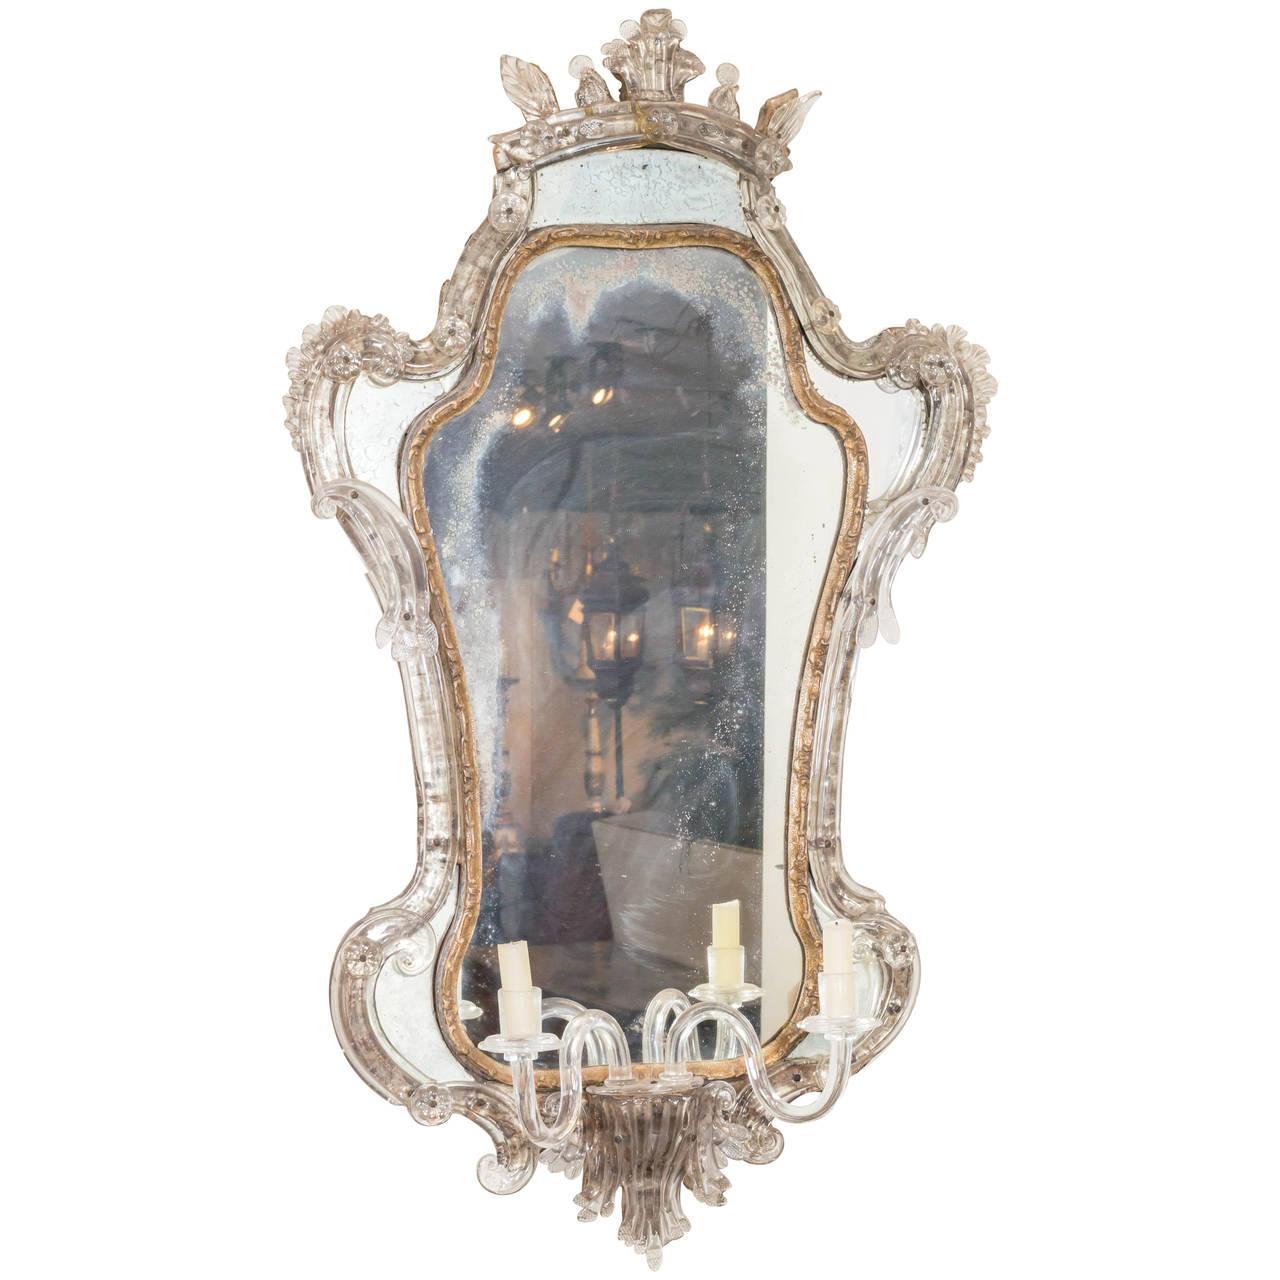 antique mirror bear glass - HD1024×1024